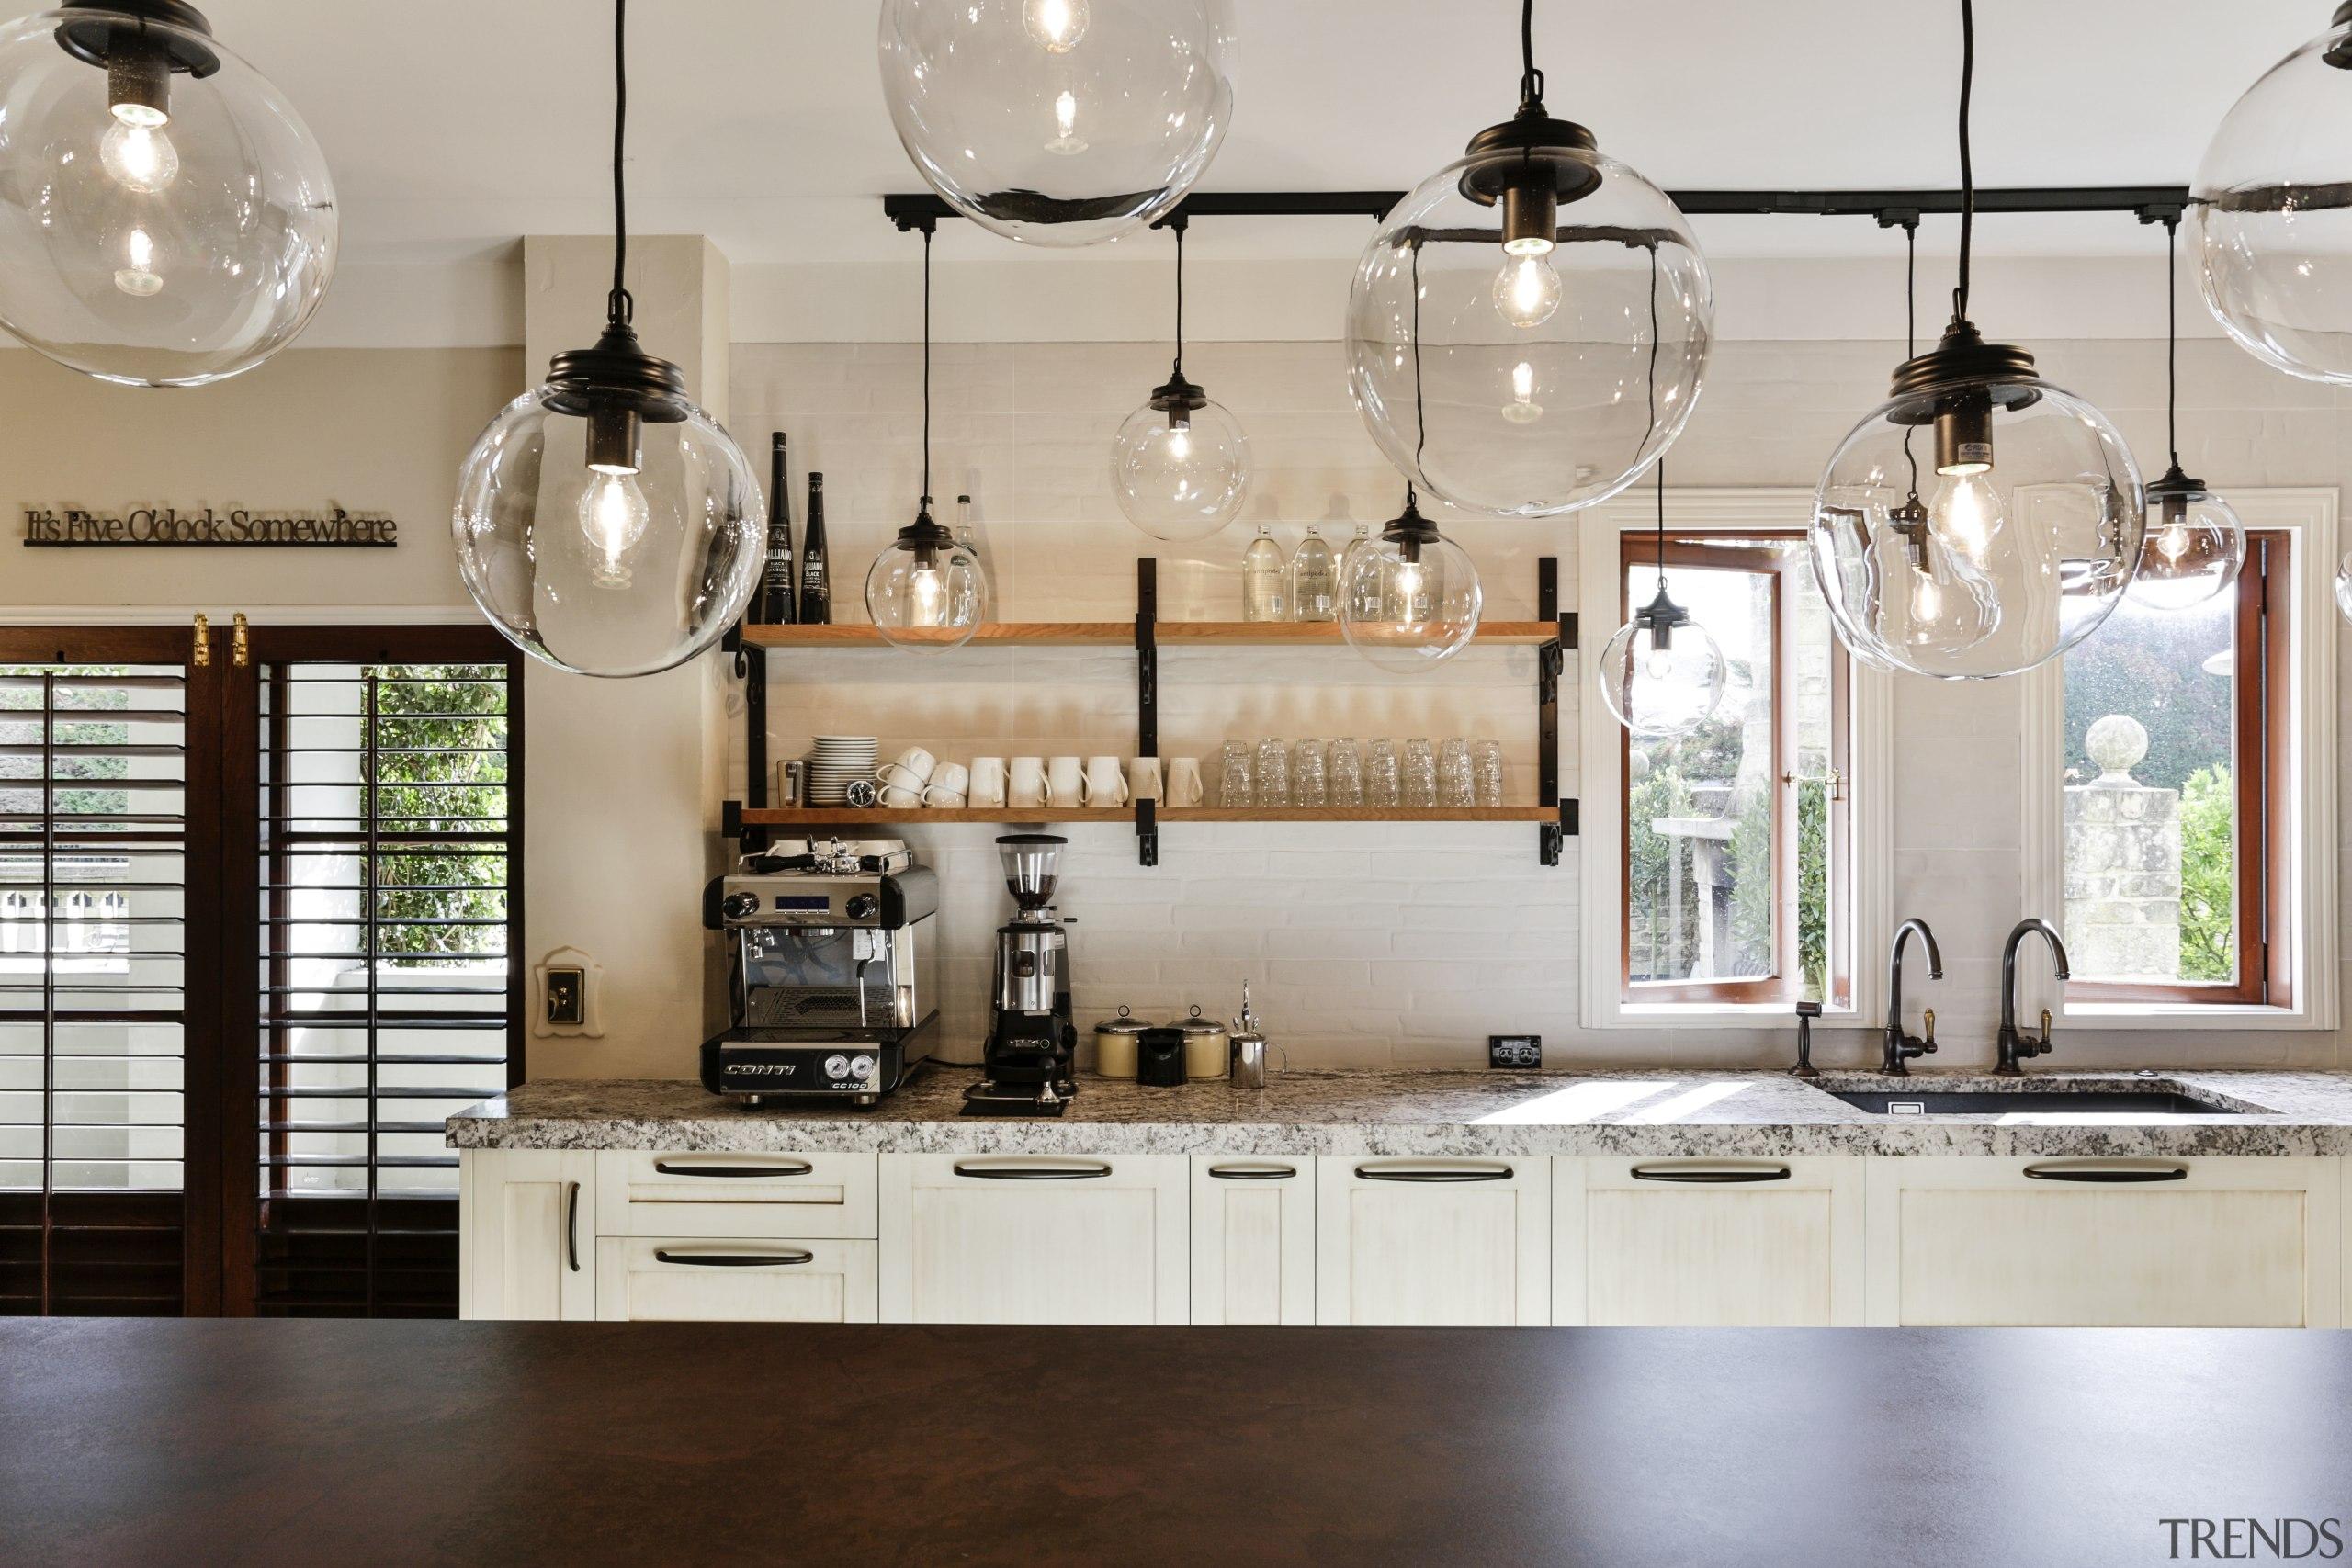 Feature pendant lights, wrought iron shelf brackets and ceiling, chandelier, countertop, cuisine classique, home, interior design, kitchen, light fixture, lighting, gray